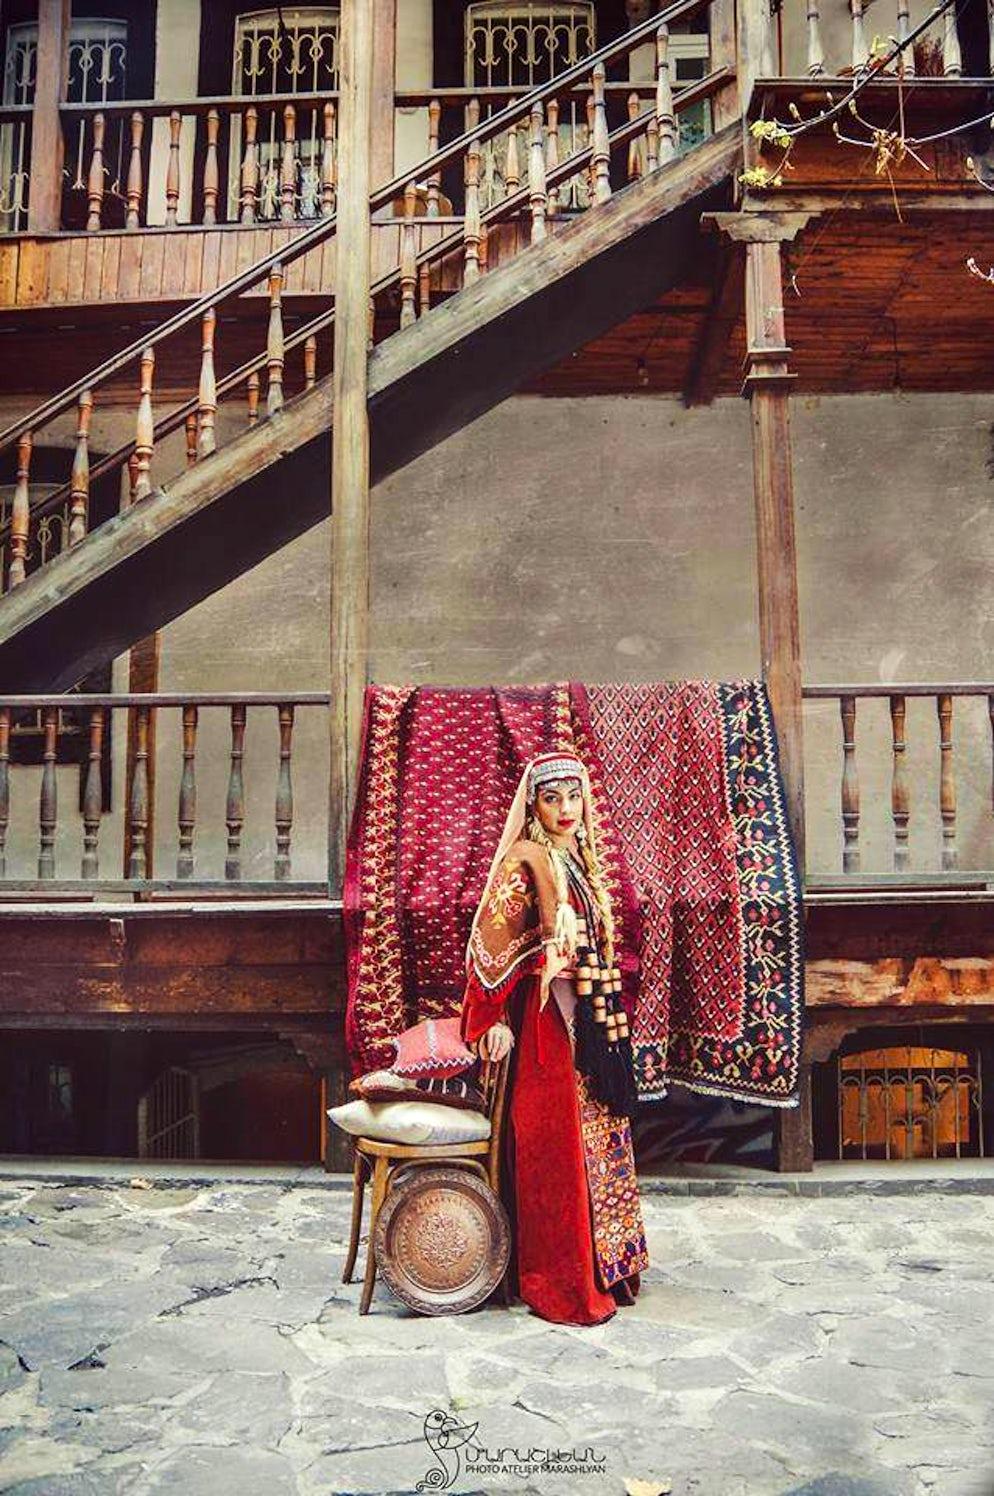 Picture © credits to Photo Atelier Marashlyan